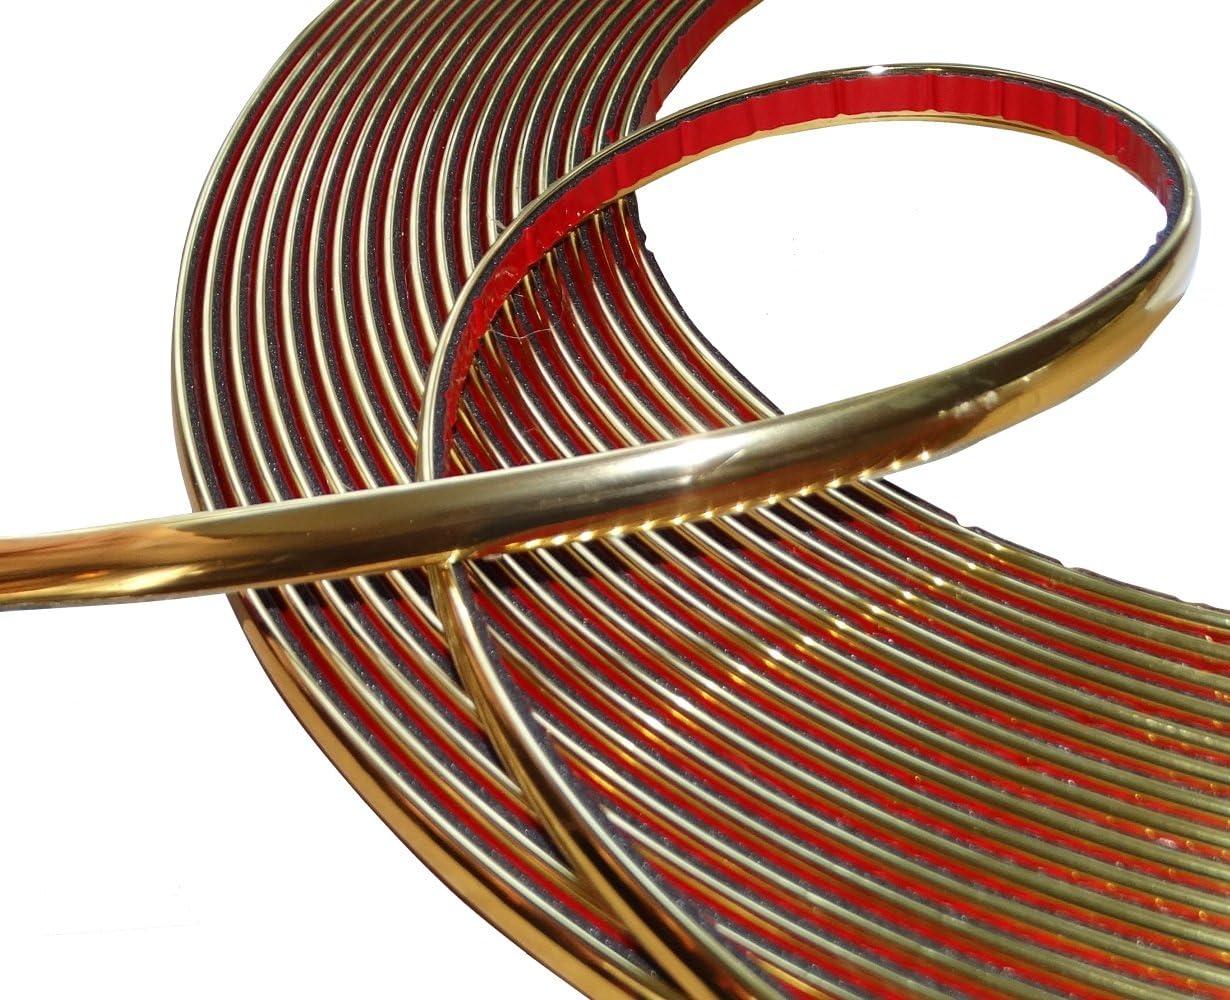 Aerzetix 10mm 4 5m Stick Klebeband Goldene Farbe Gold Elektronik